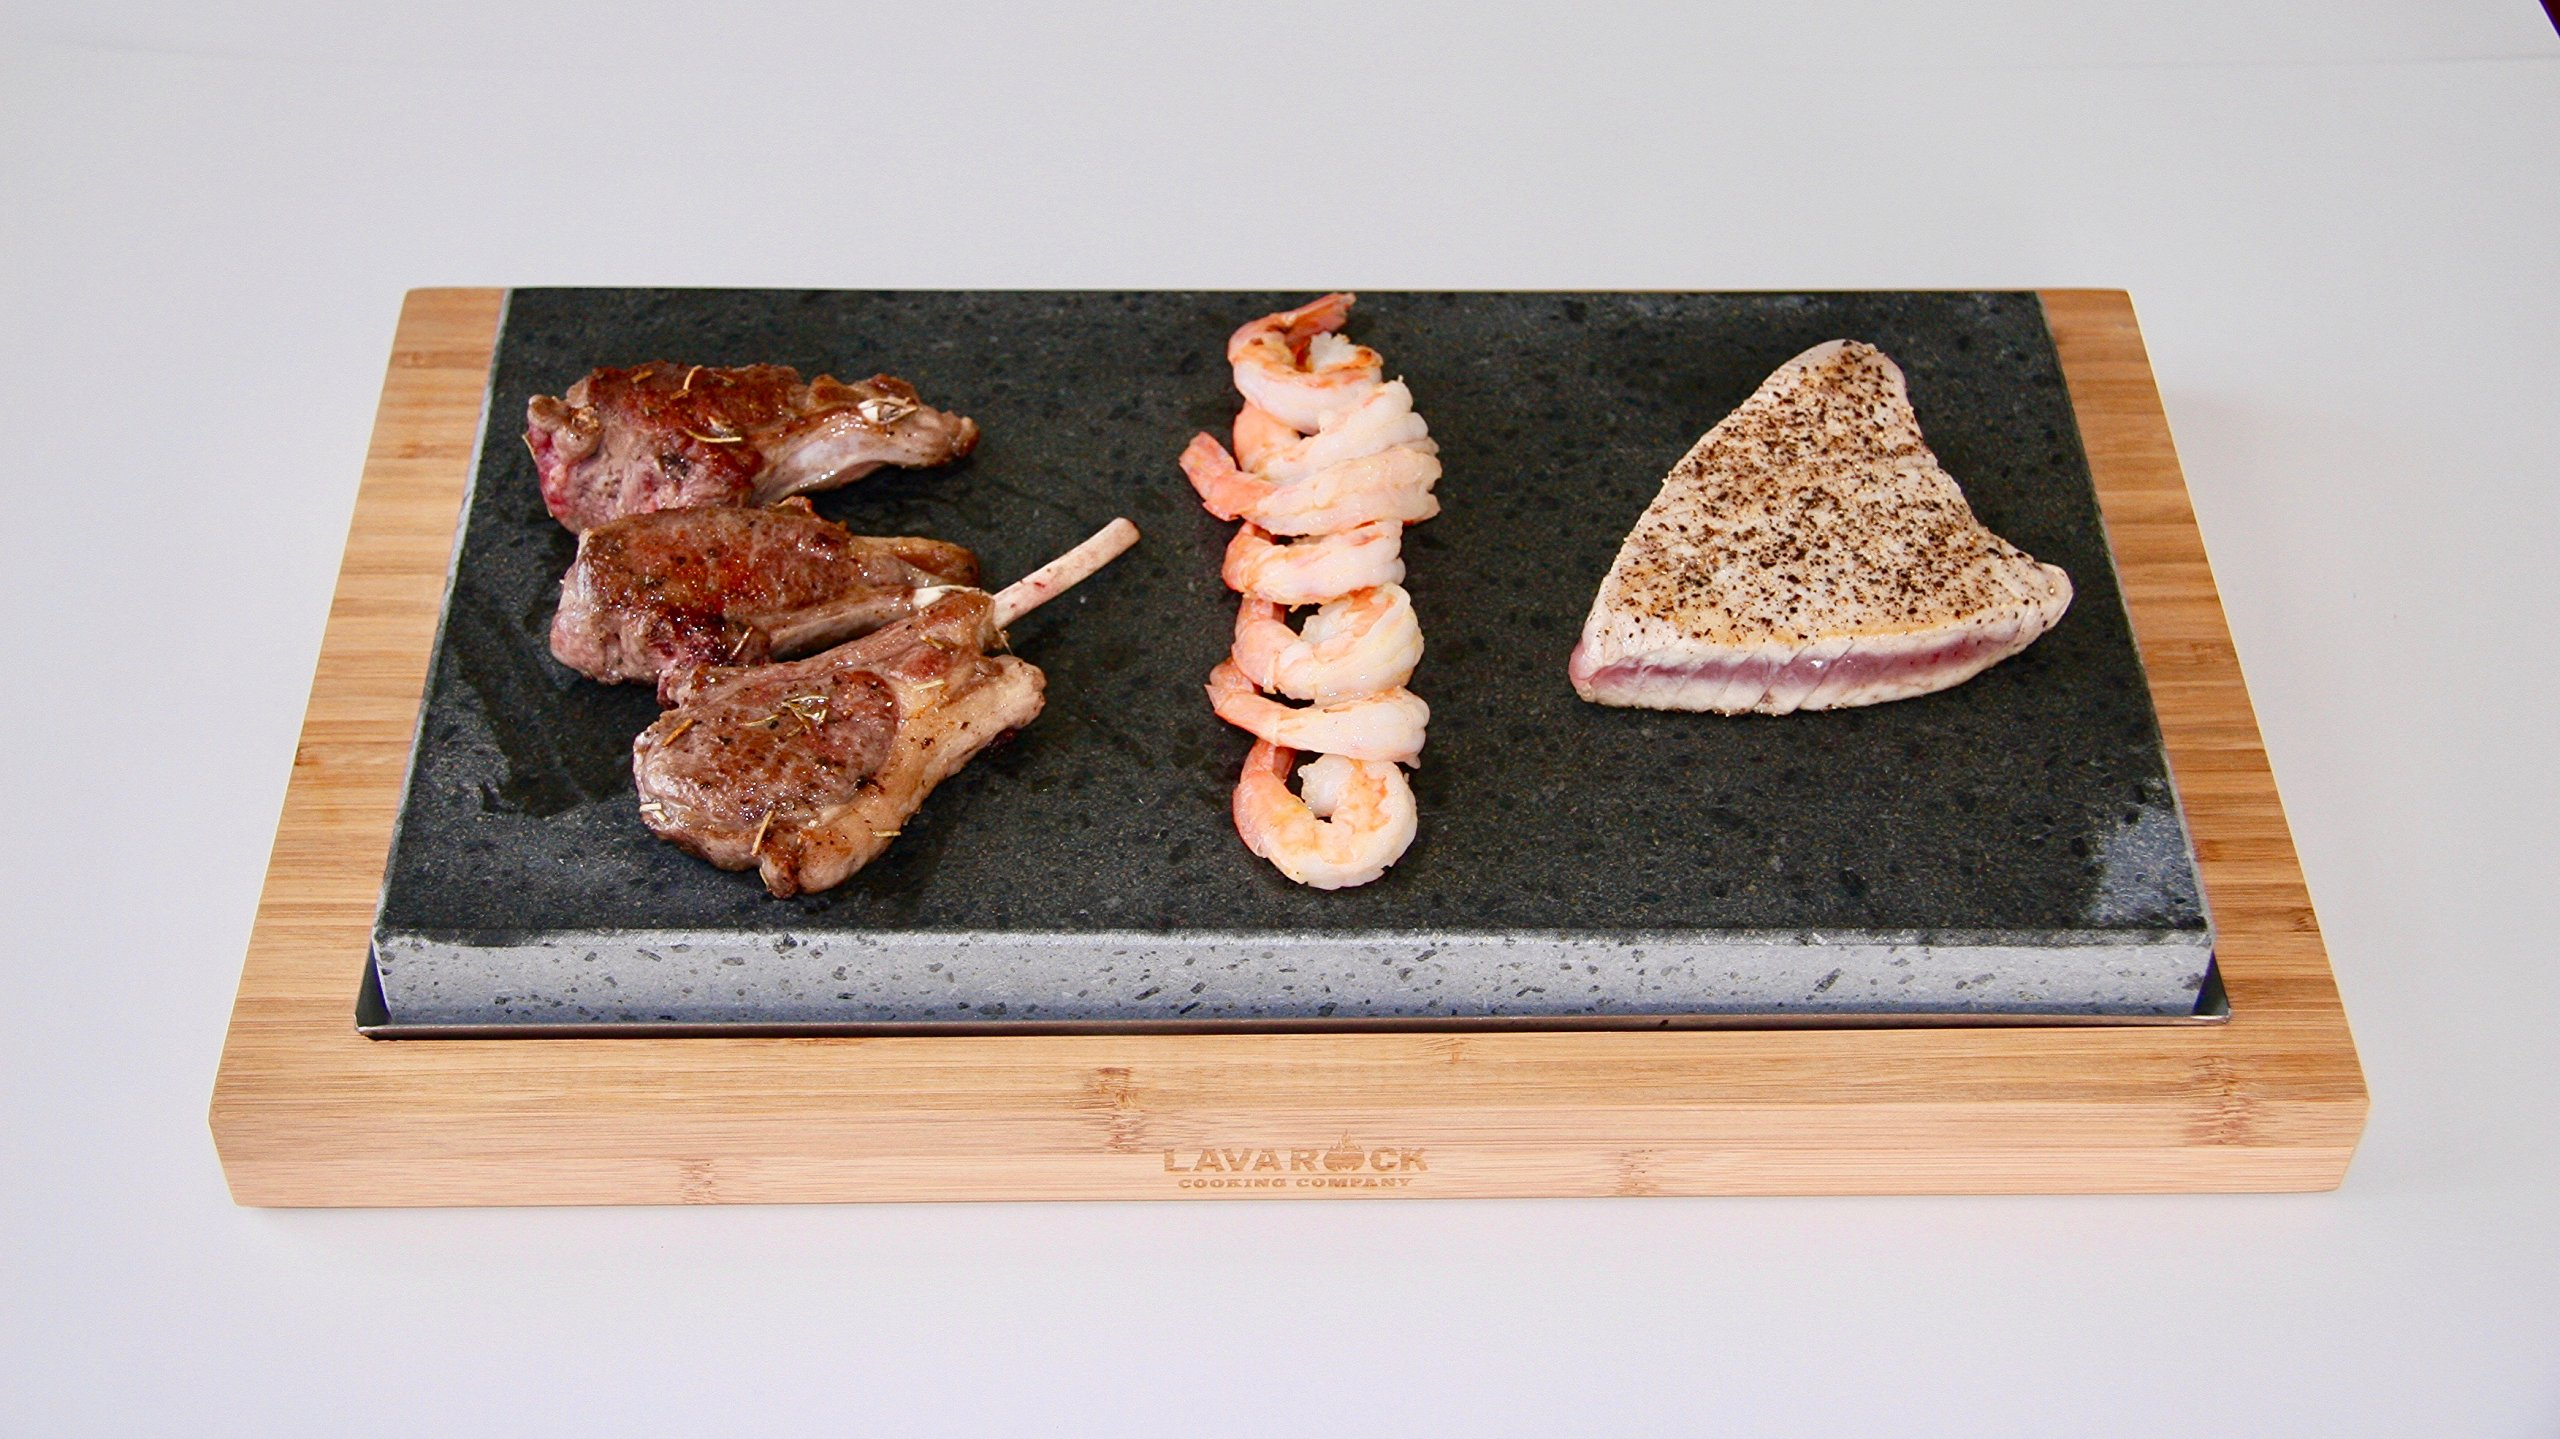 Lava Rock Cooking Sharing Platter LR2